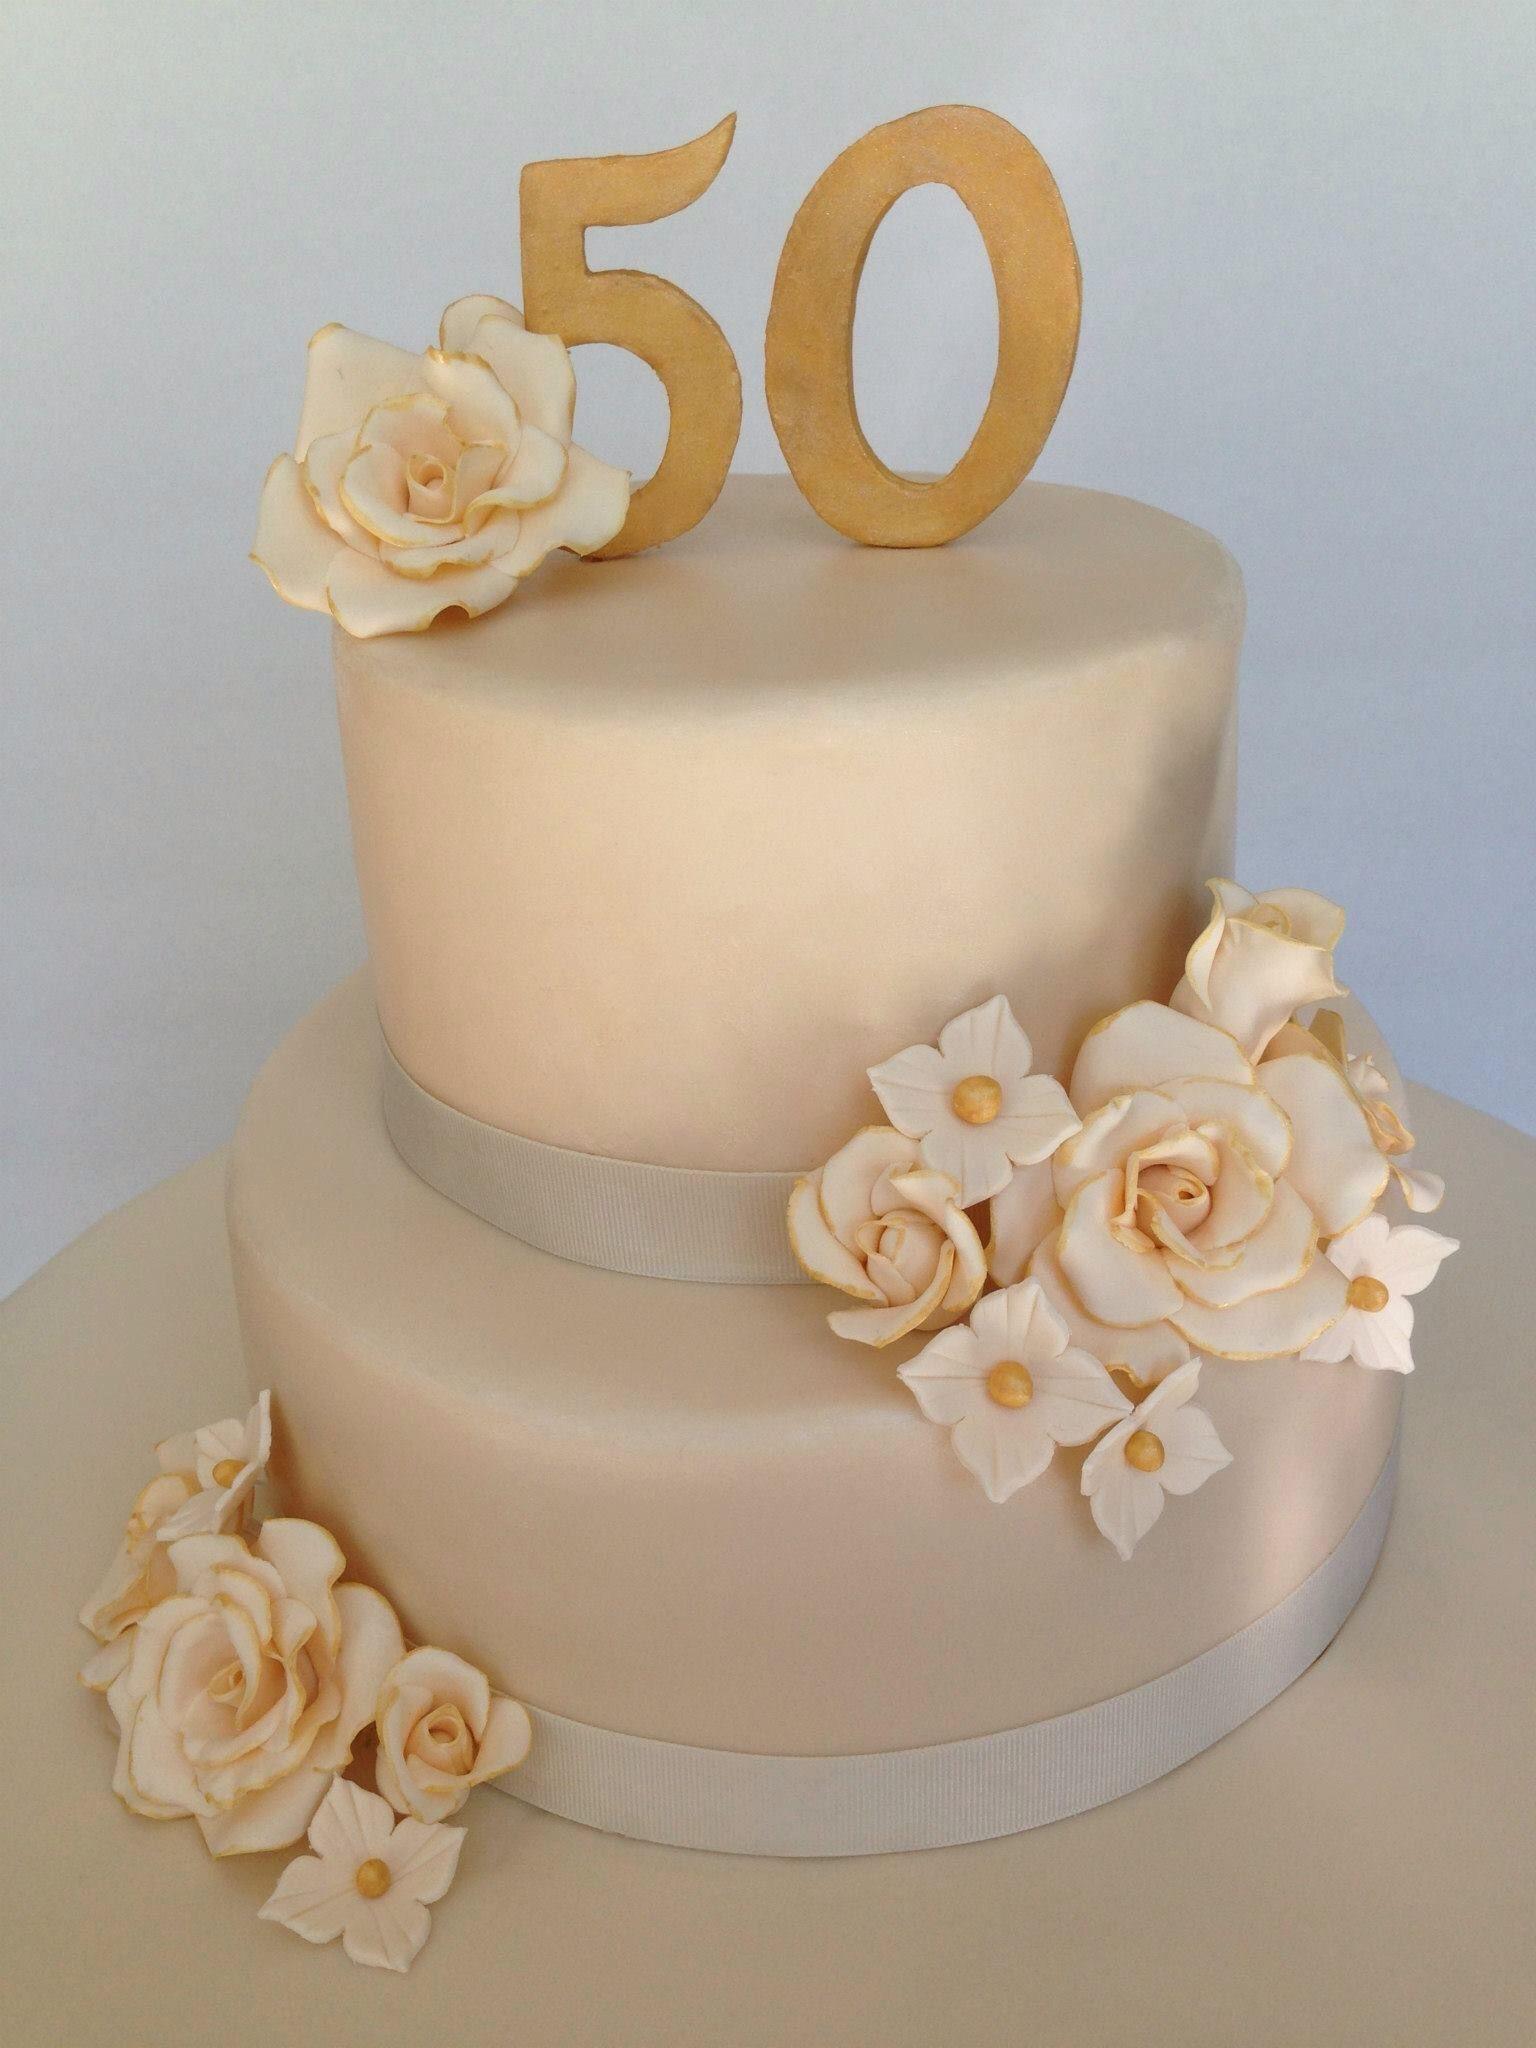 50Th Wedding Cakes  50th wedding anniversary cake simple yet elegant